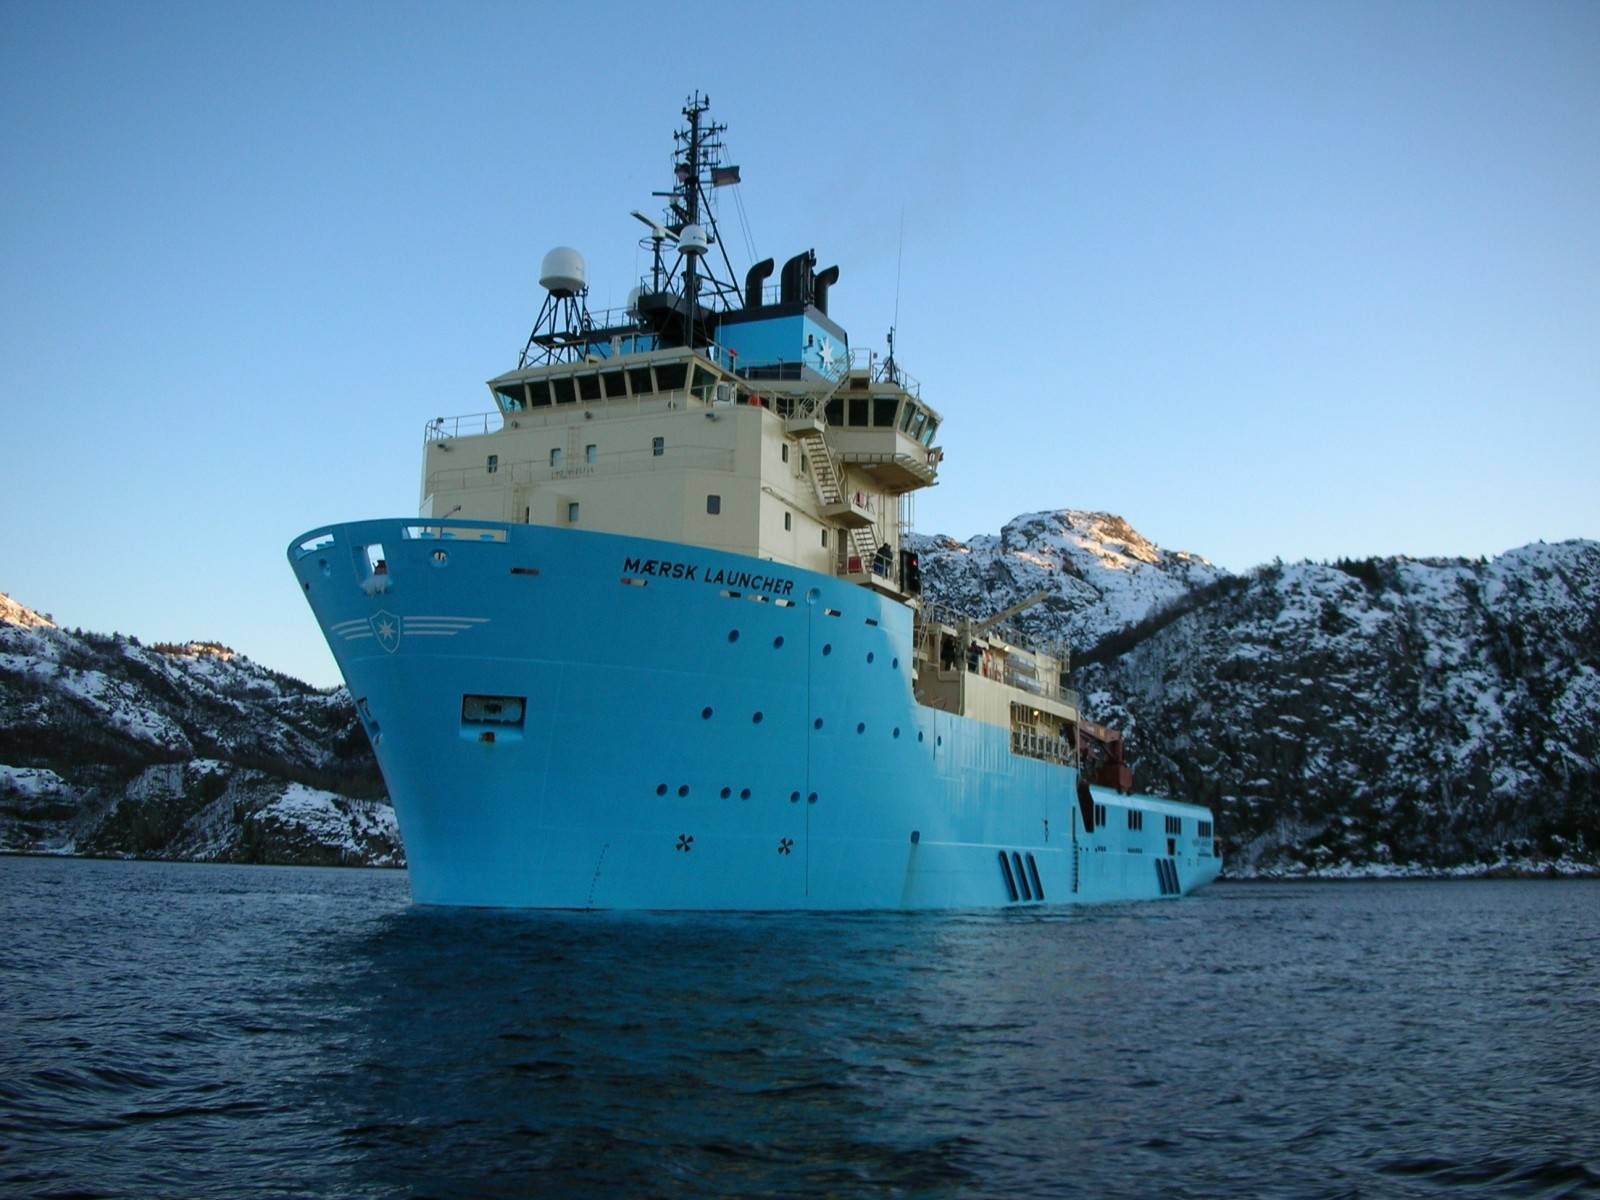 https://images.marinelink.com/images/maritime/maersk-launcher-photo-maersk-supply-89459.jpg